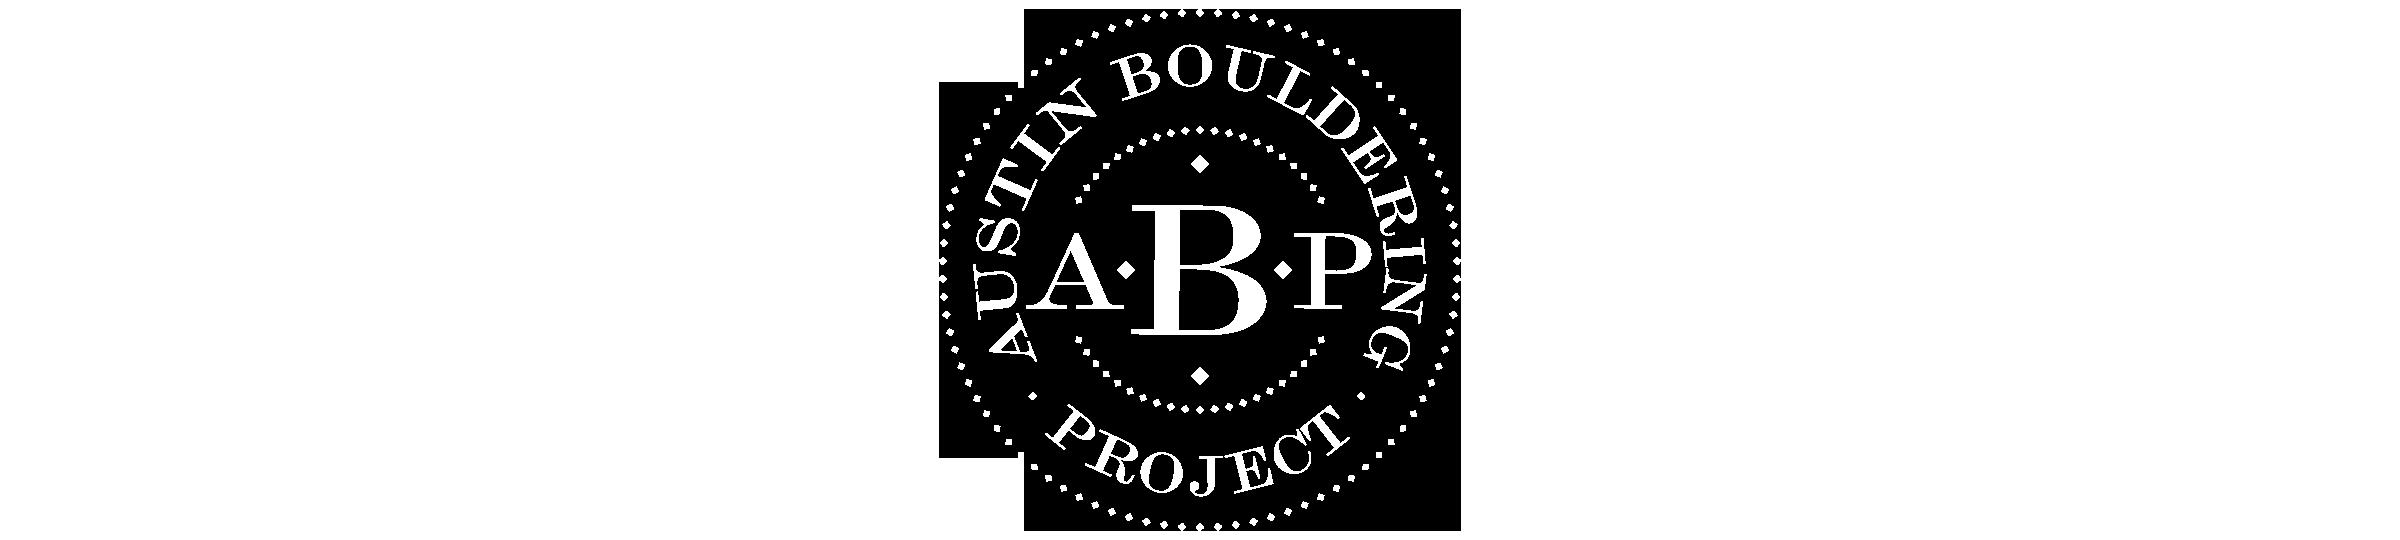 ABP_logo_white_2400.png